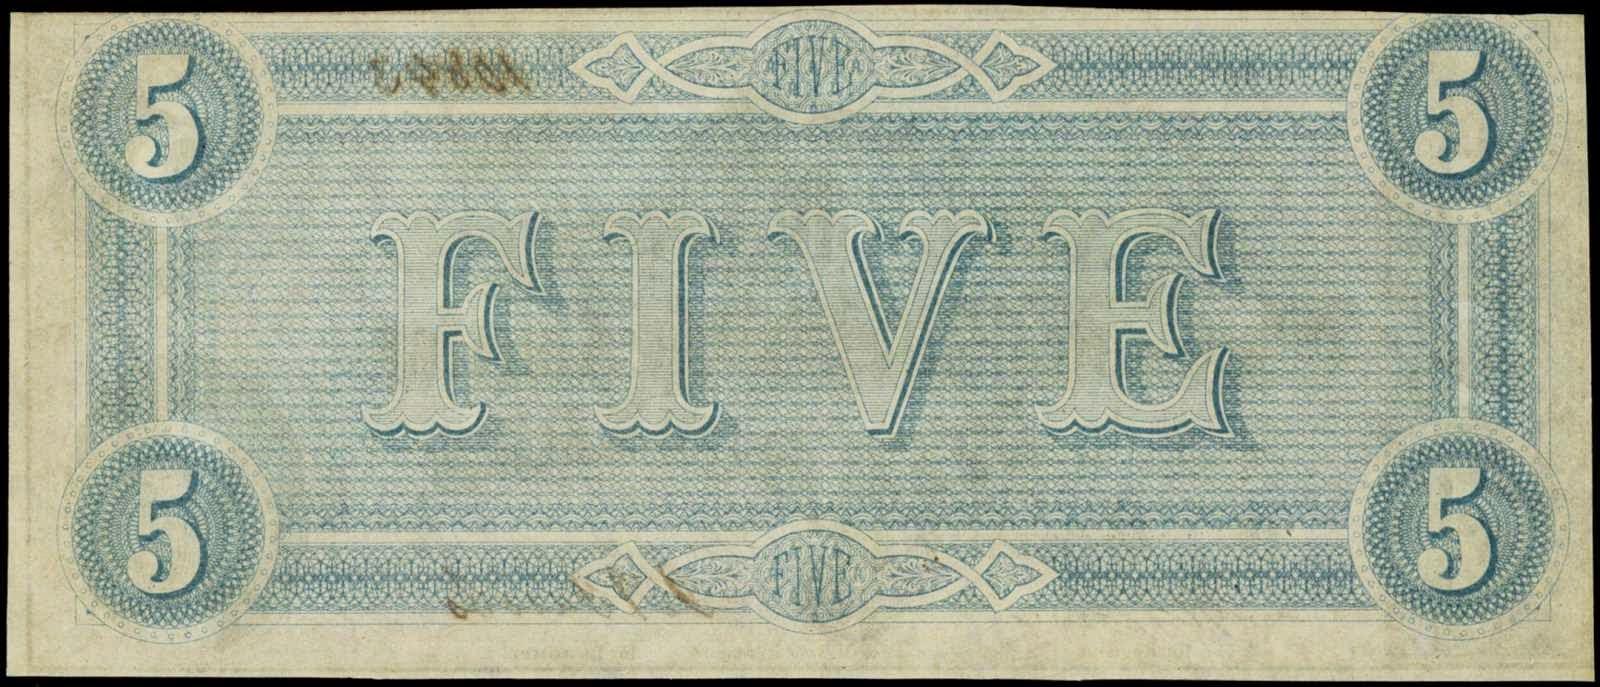 Confederate Paper Money 1864 Five Dollar Bill note